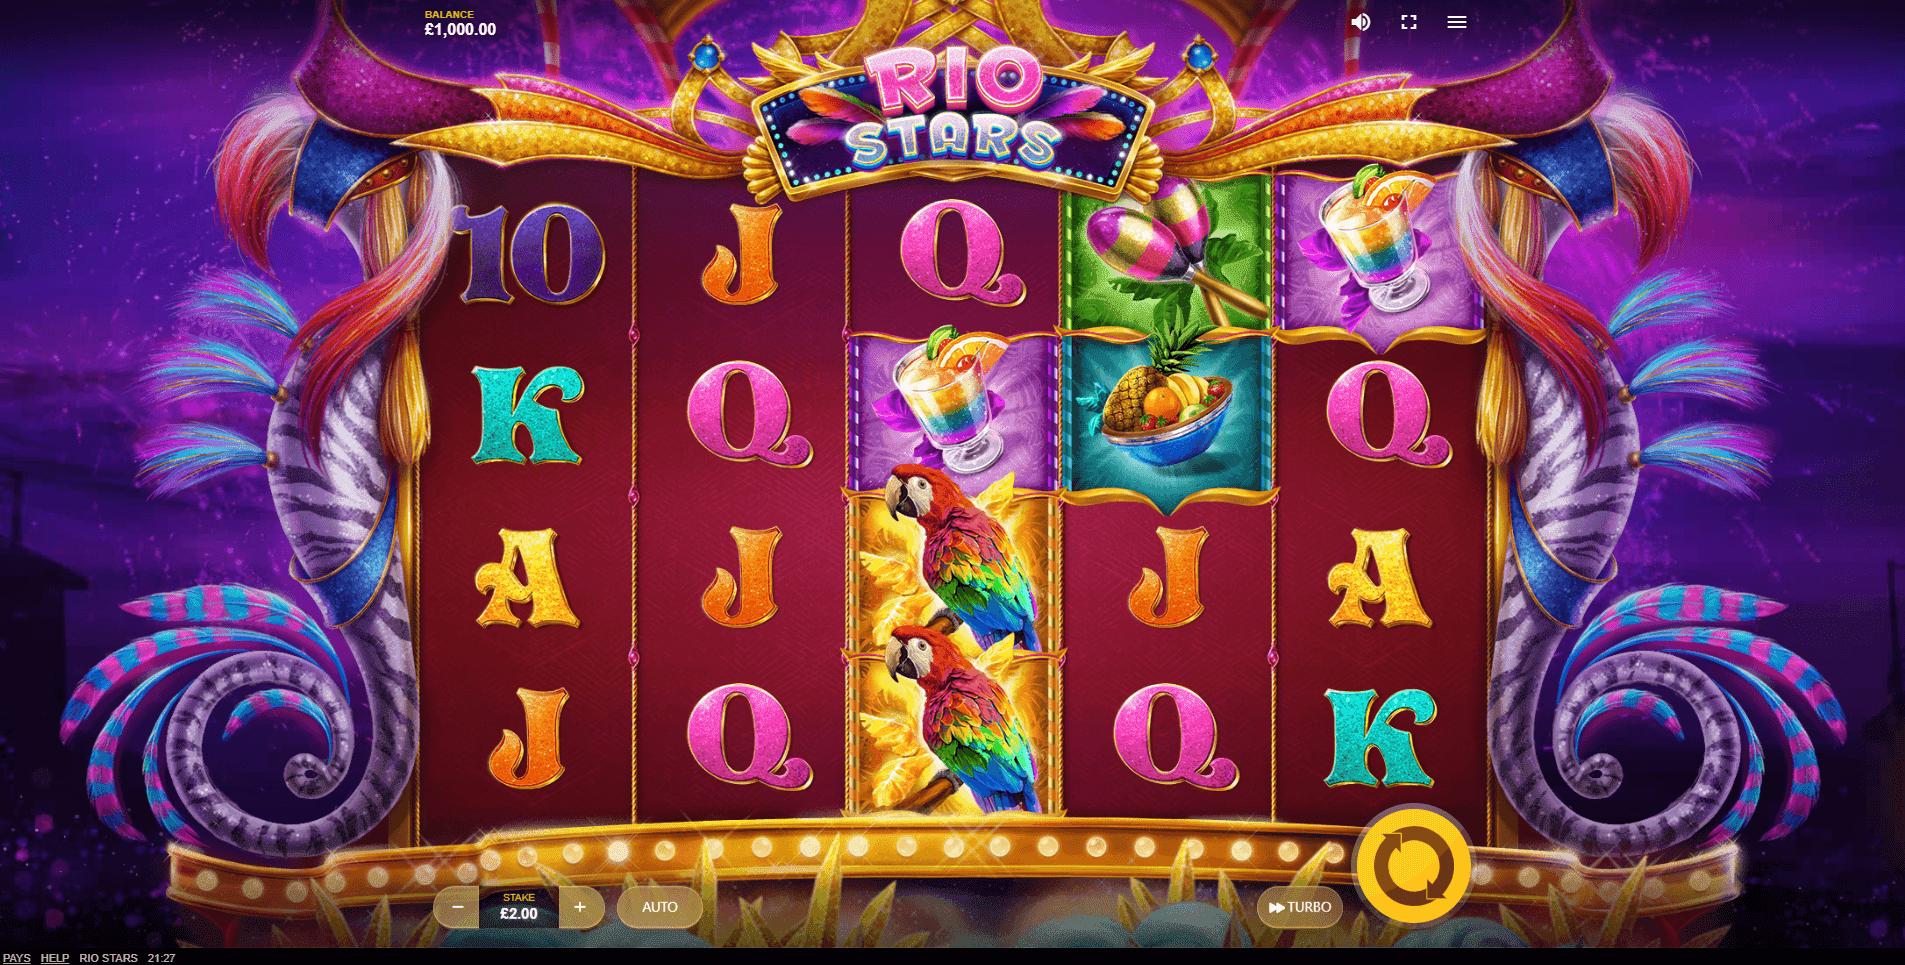 Rio Stars slot machine screenshot